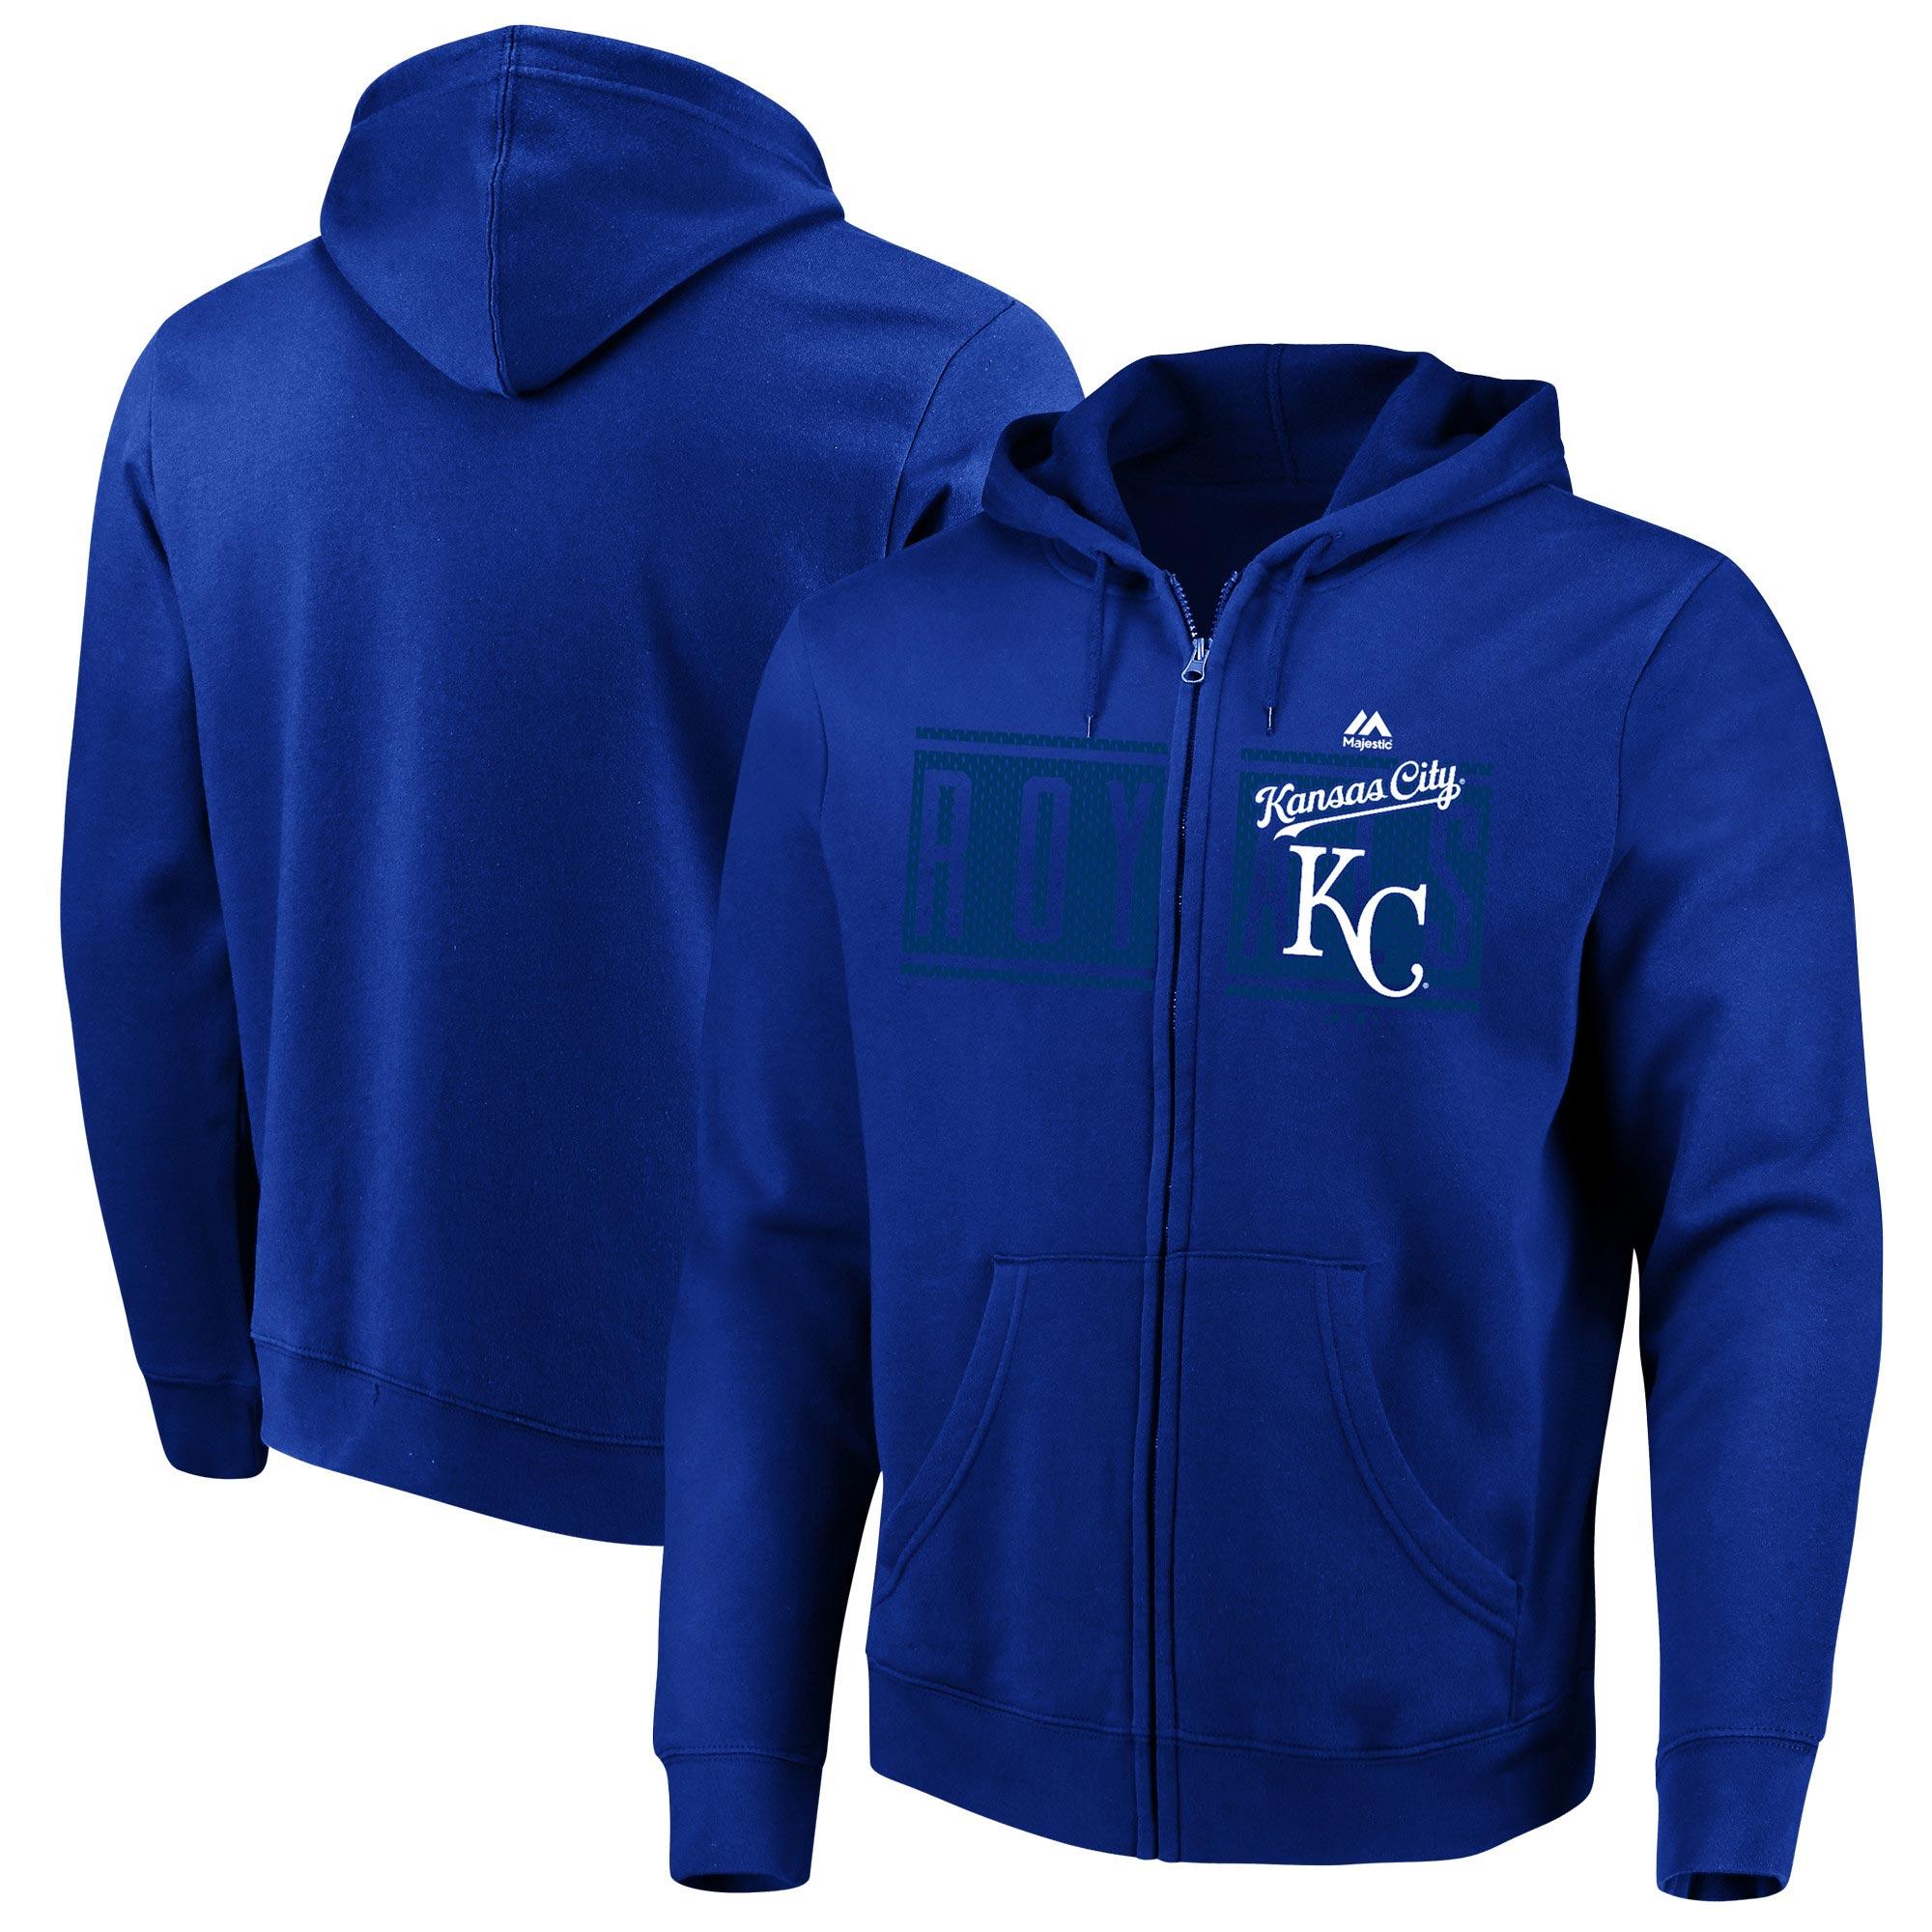 Kansas City Royals Majestic Piercing Attack Full-Zip Hoodie - Royal